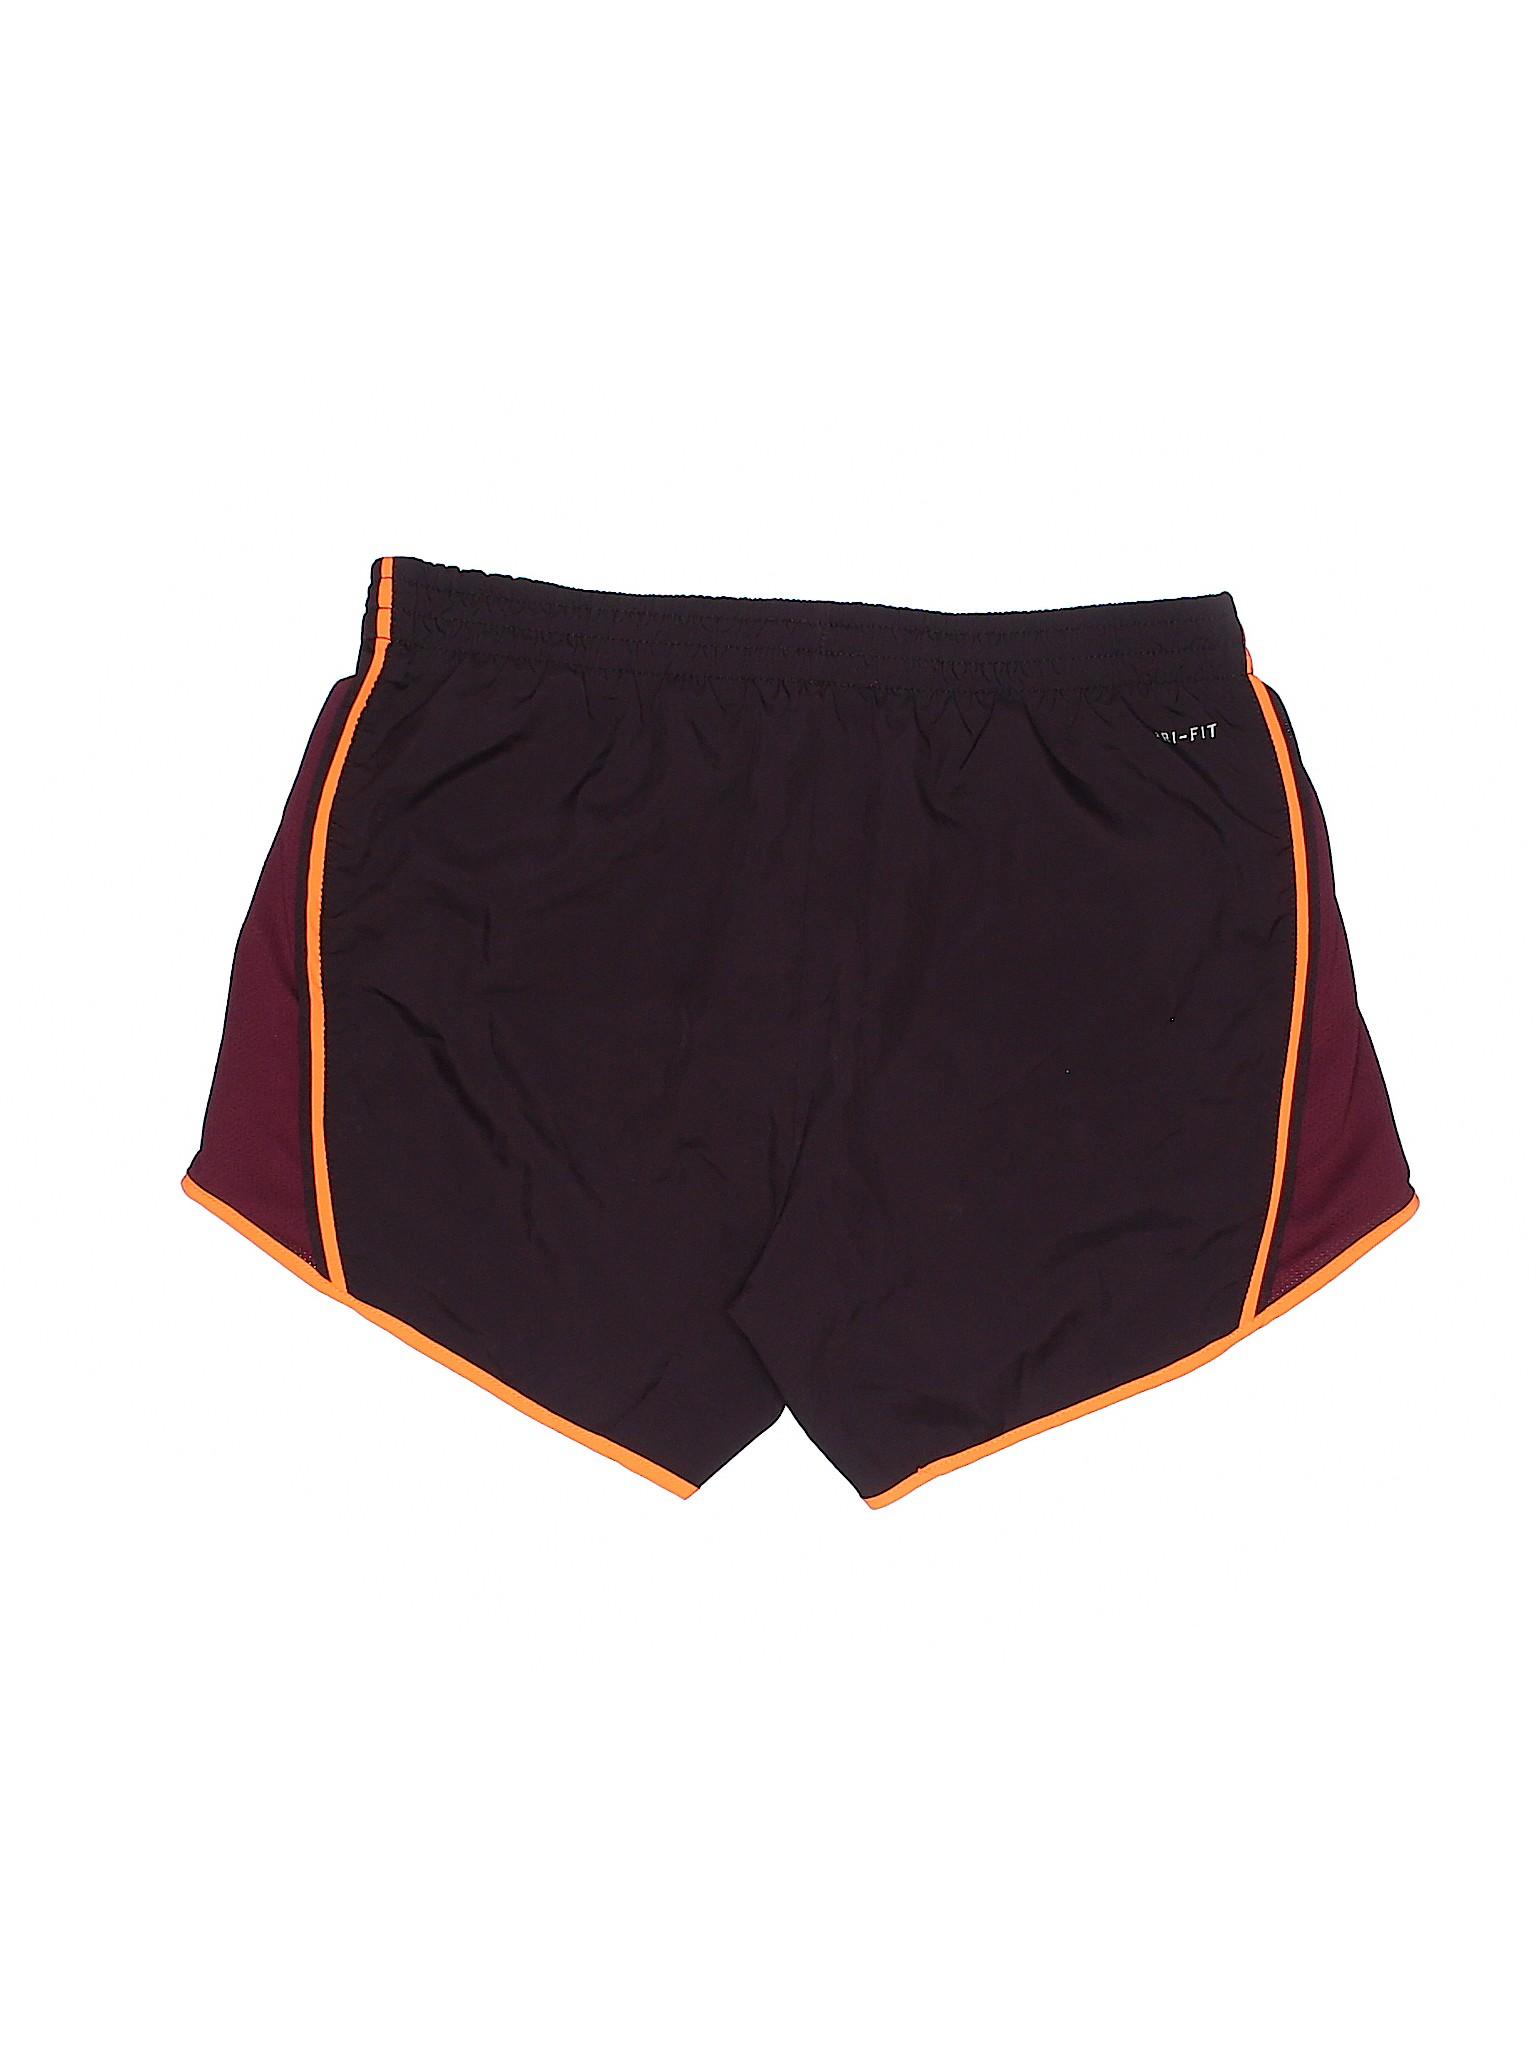 Shorts Boutique Boutique Nike Nike Athletic wqFXZIIa